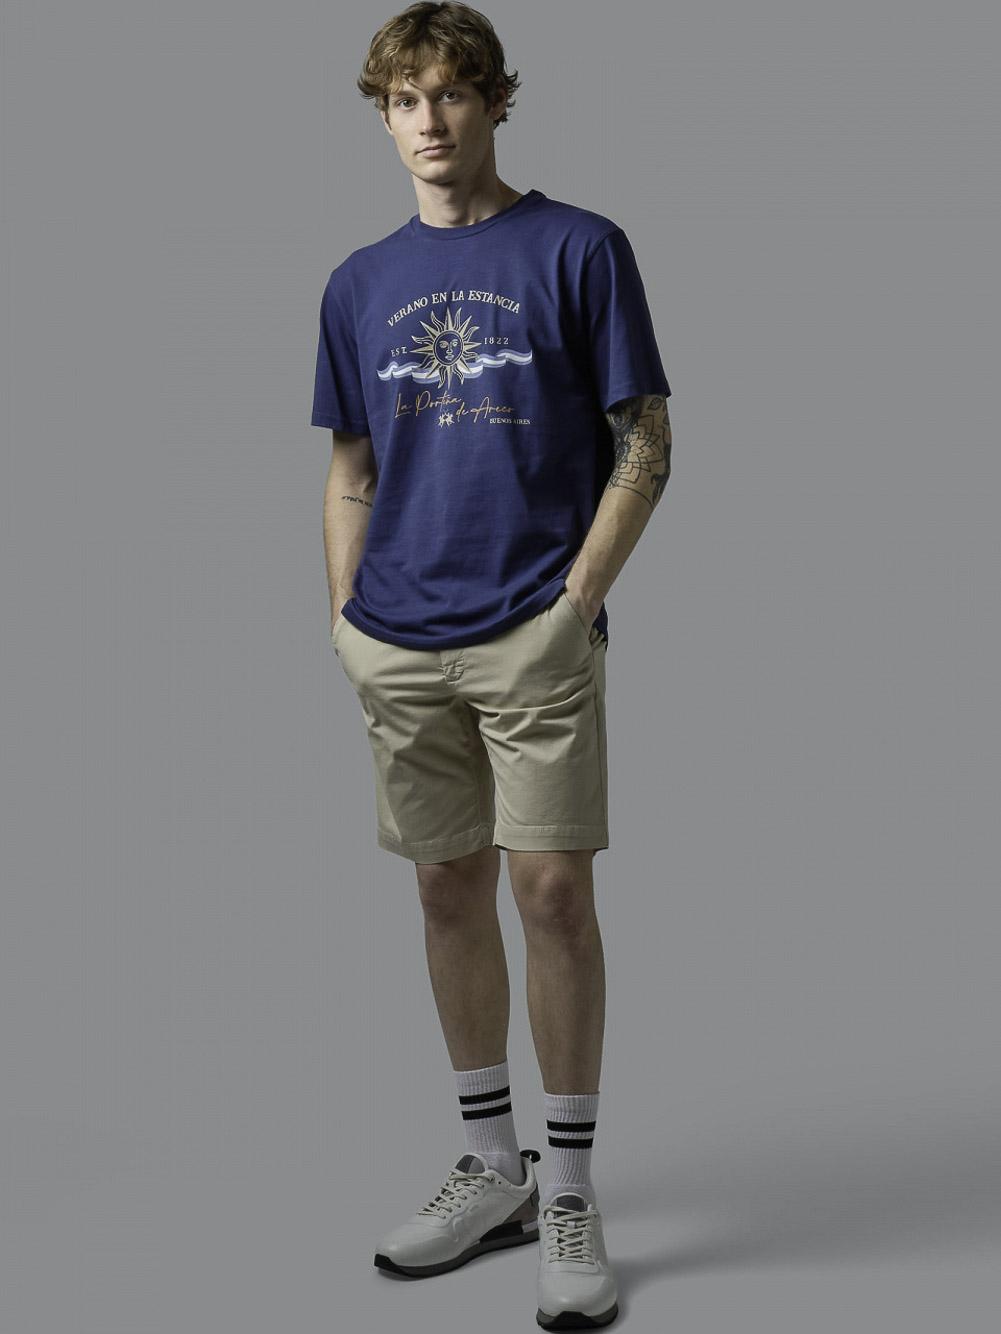 LA MARTINA Μπλούζα t-shirt 3LMRMR015-7048 ΡΑΦ